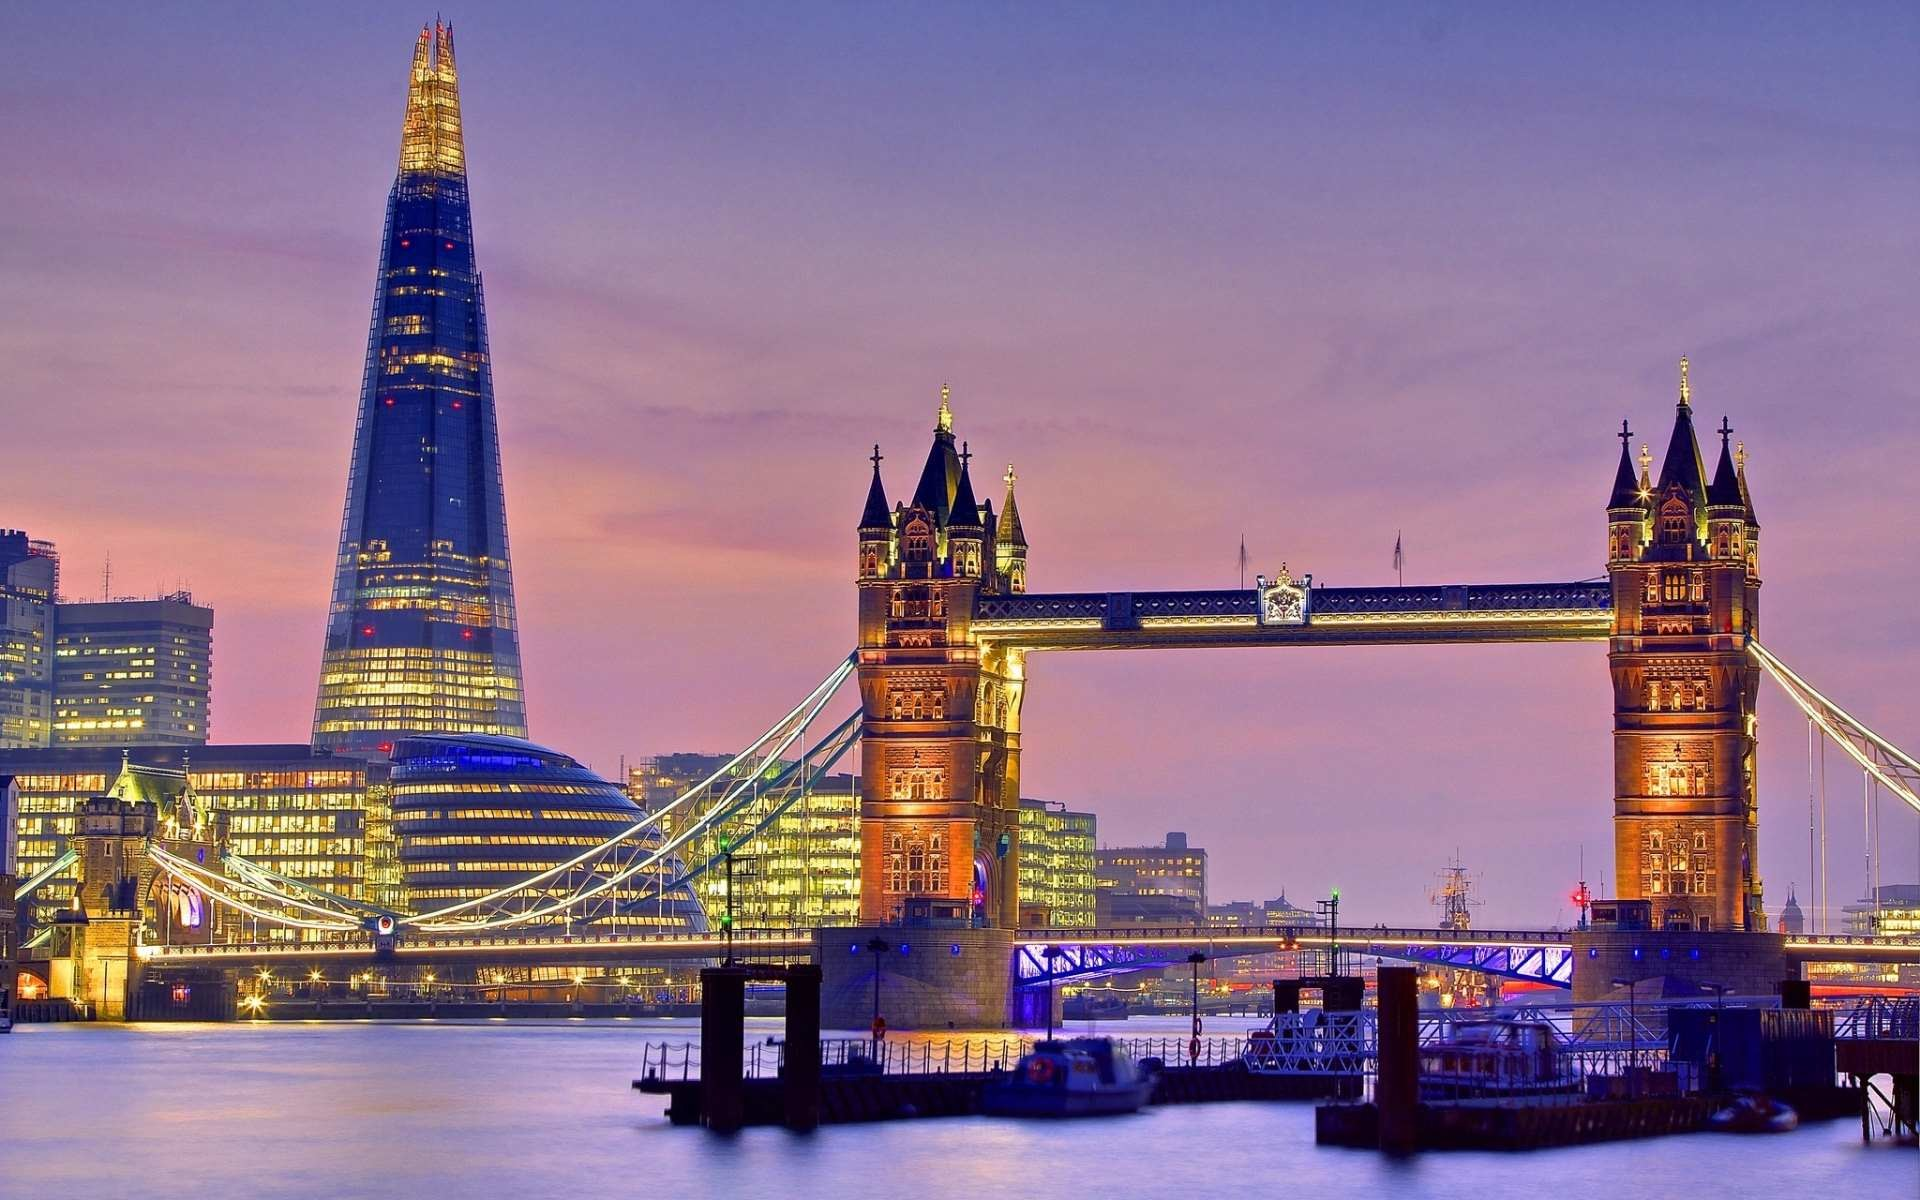 Res: 1920x1200, Tower Bridge Wallpapers 8 - 1920 X 1200